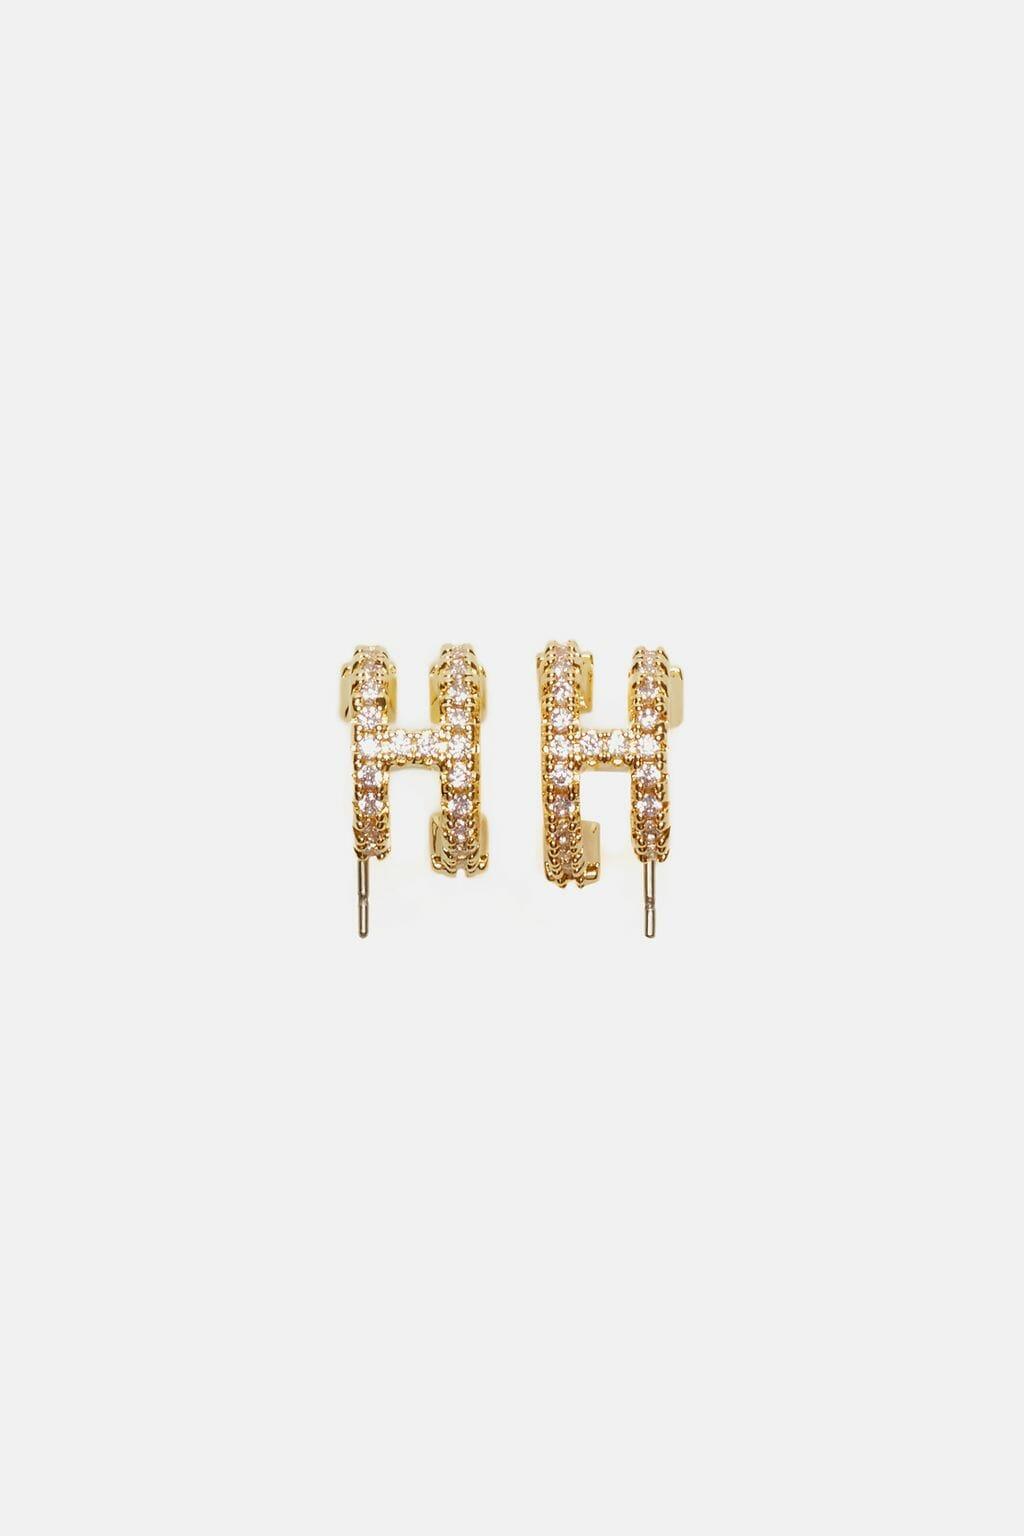 CH-Carolina-herrera-insignia-jewelry-look-25